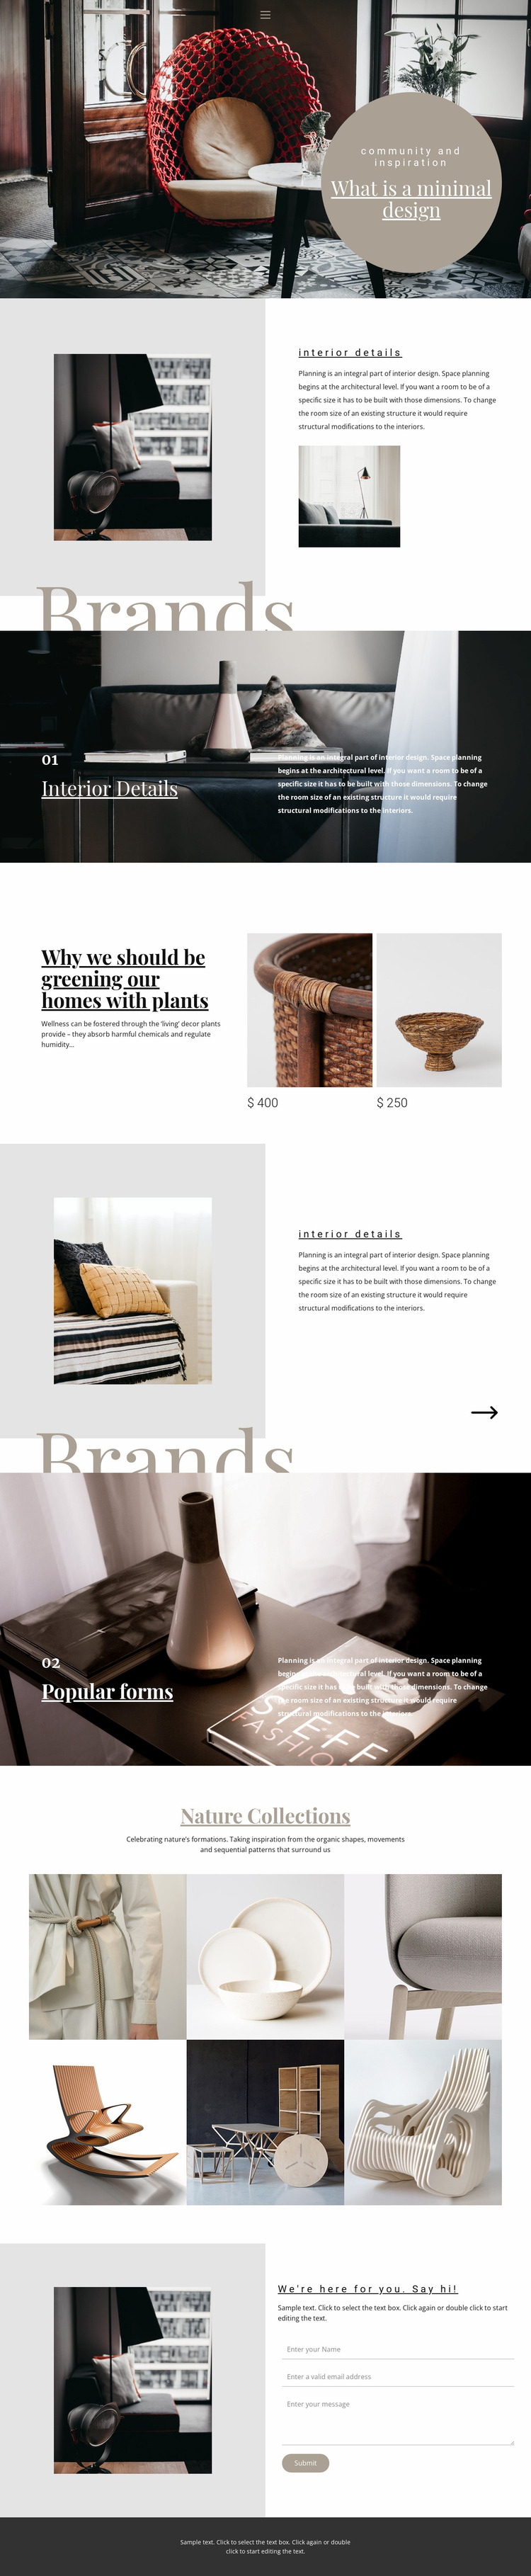 Interior brands Website Mockup